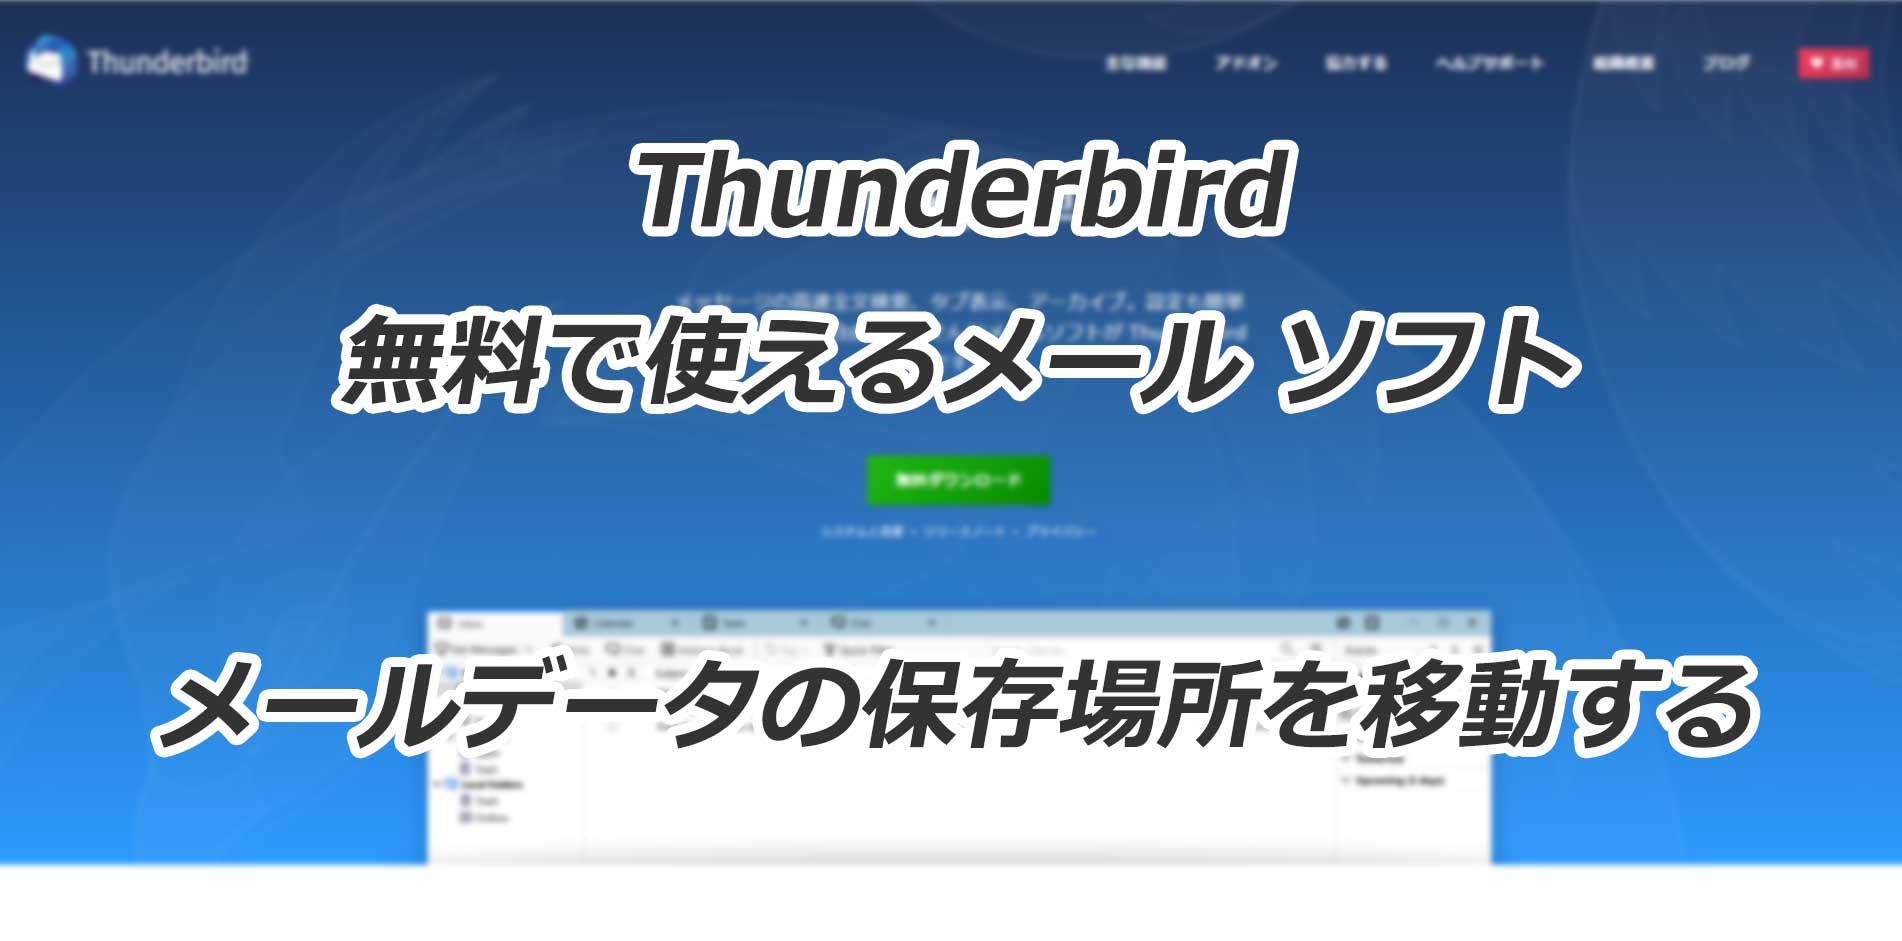 ThunderbirdのメールデータをCドライブからDドライブに移行する手順